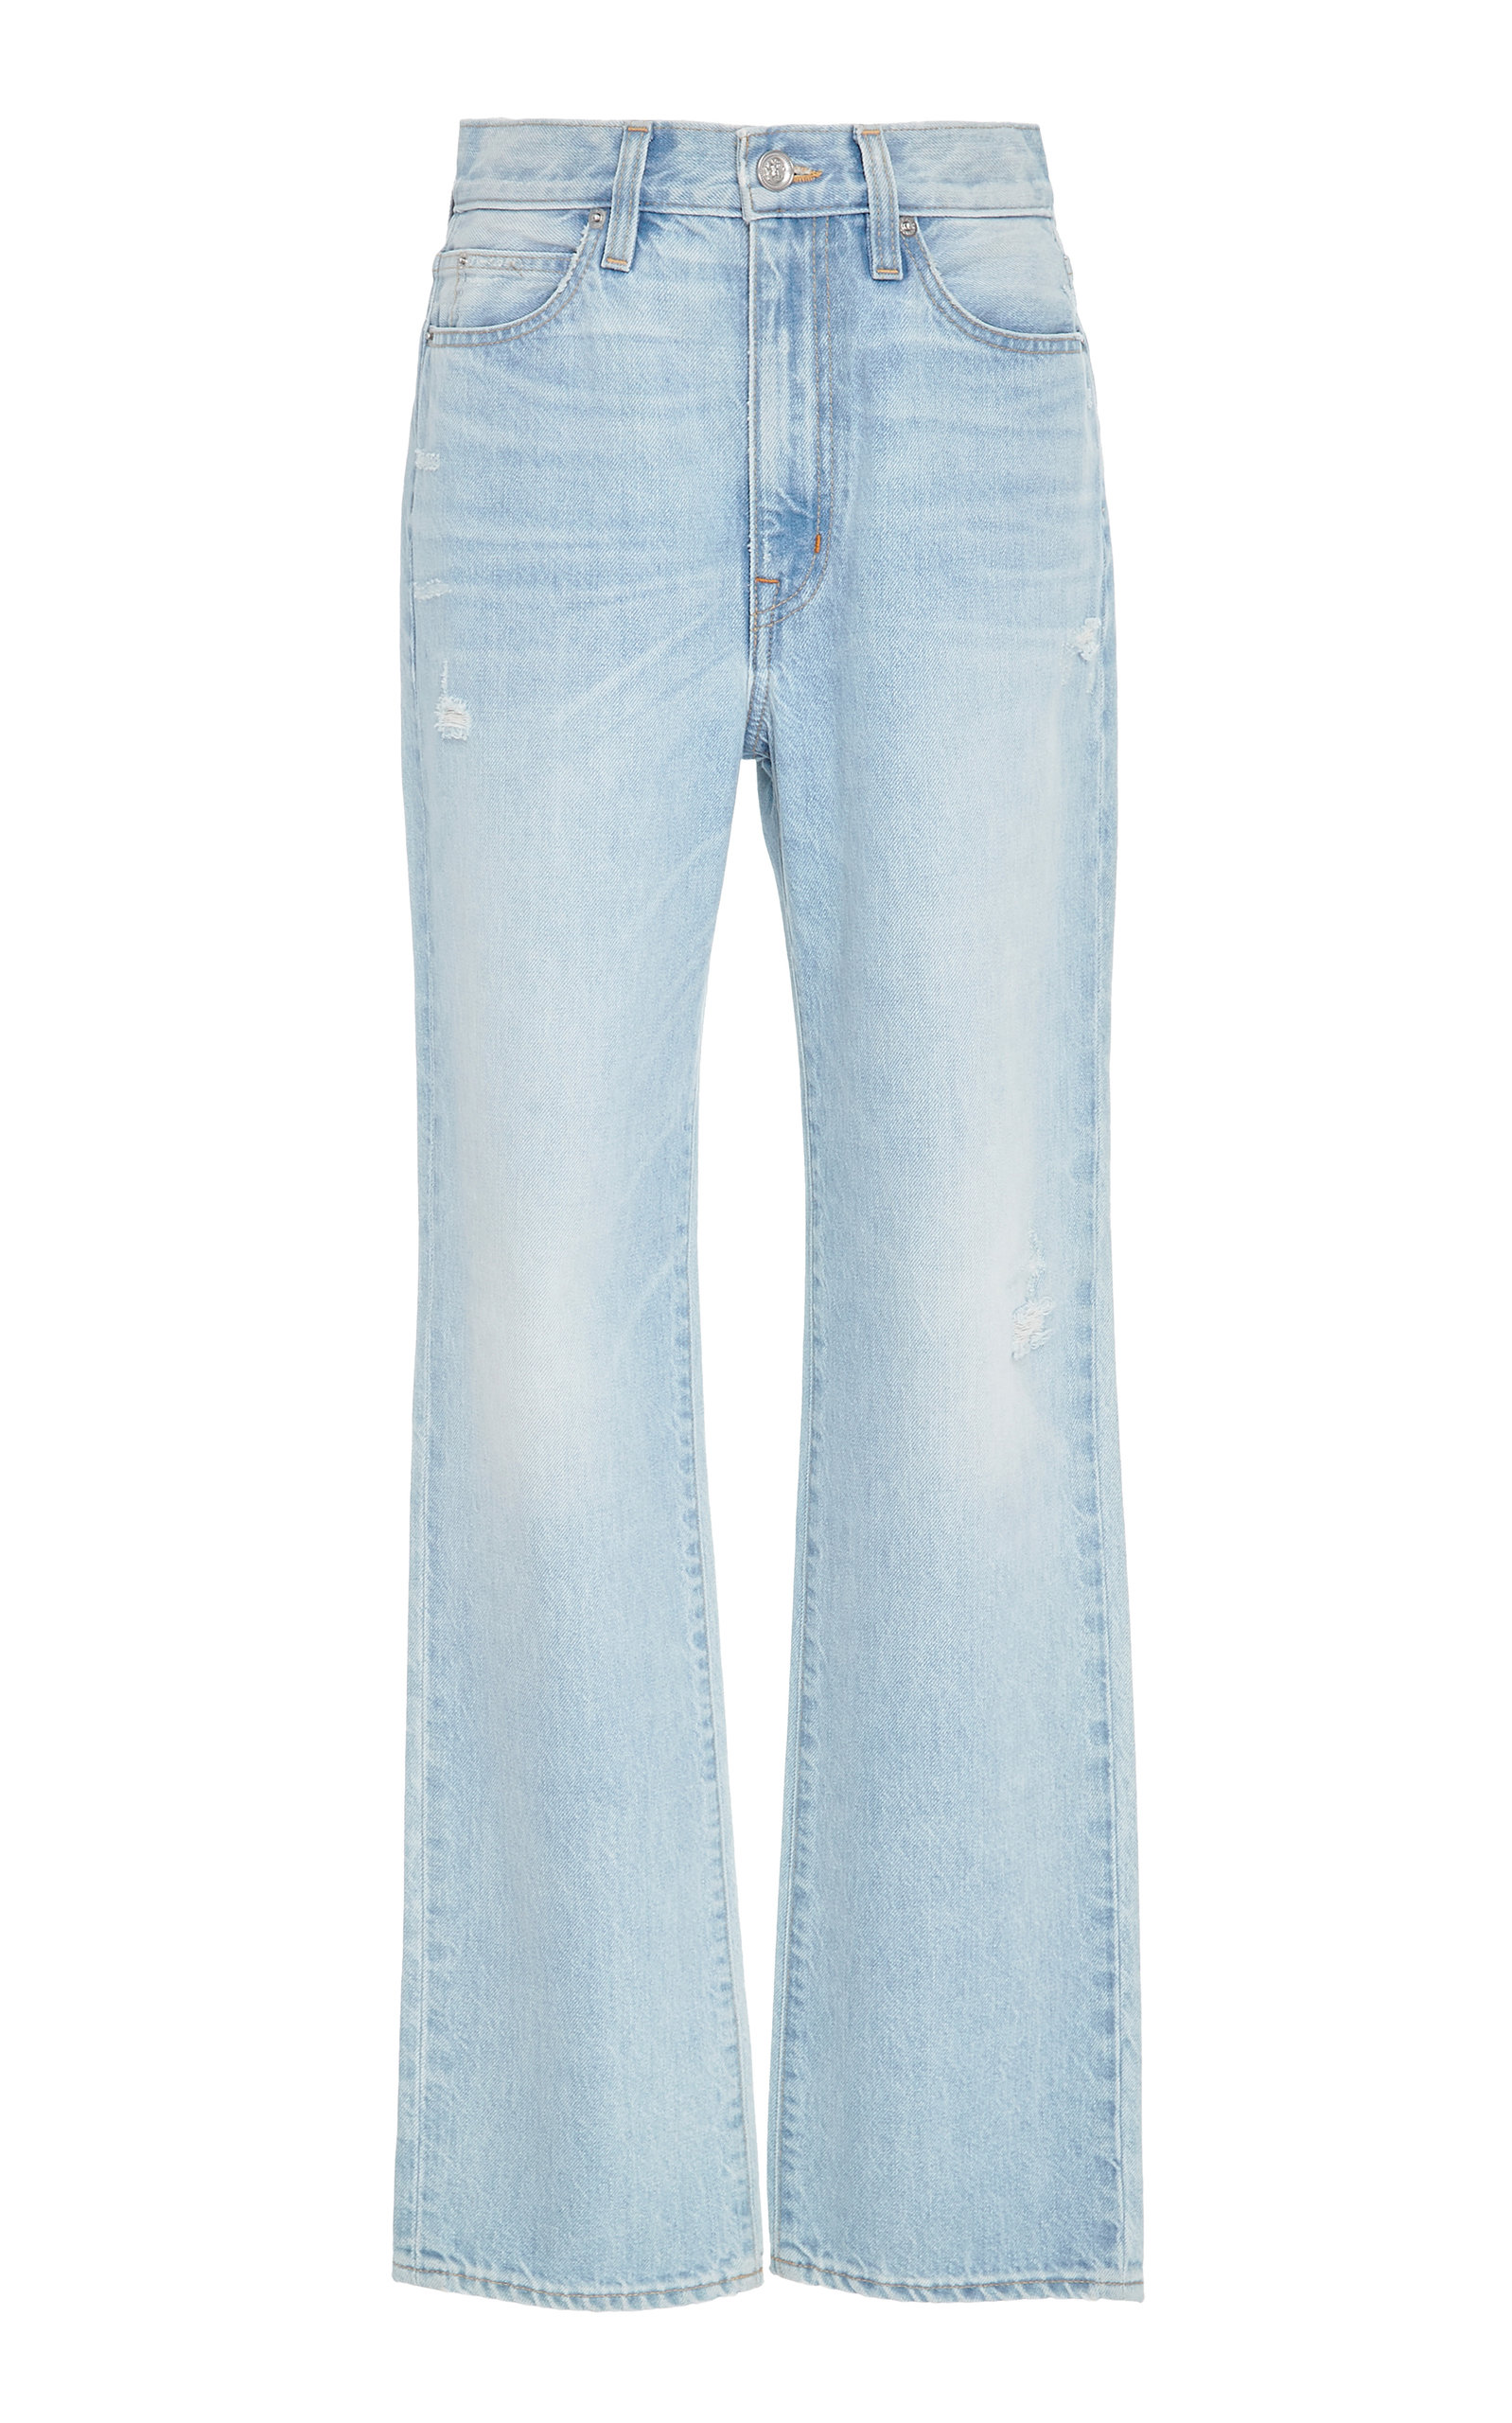 SLVRLAKE DENIM London High-Rise Straight-Leg Jeans in Light Wash